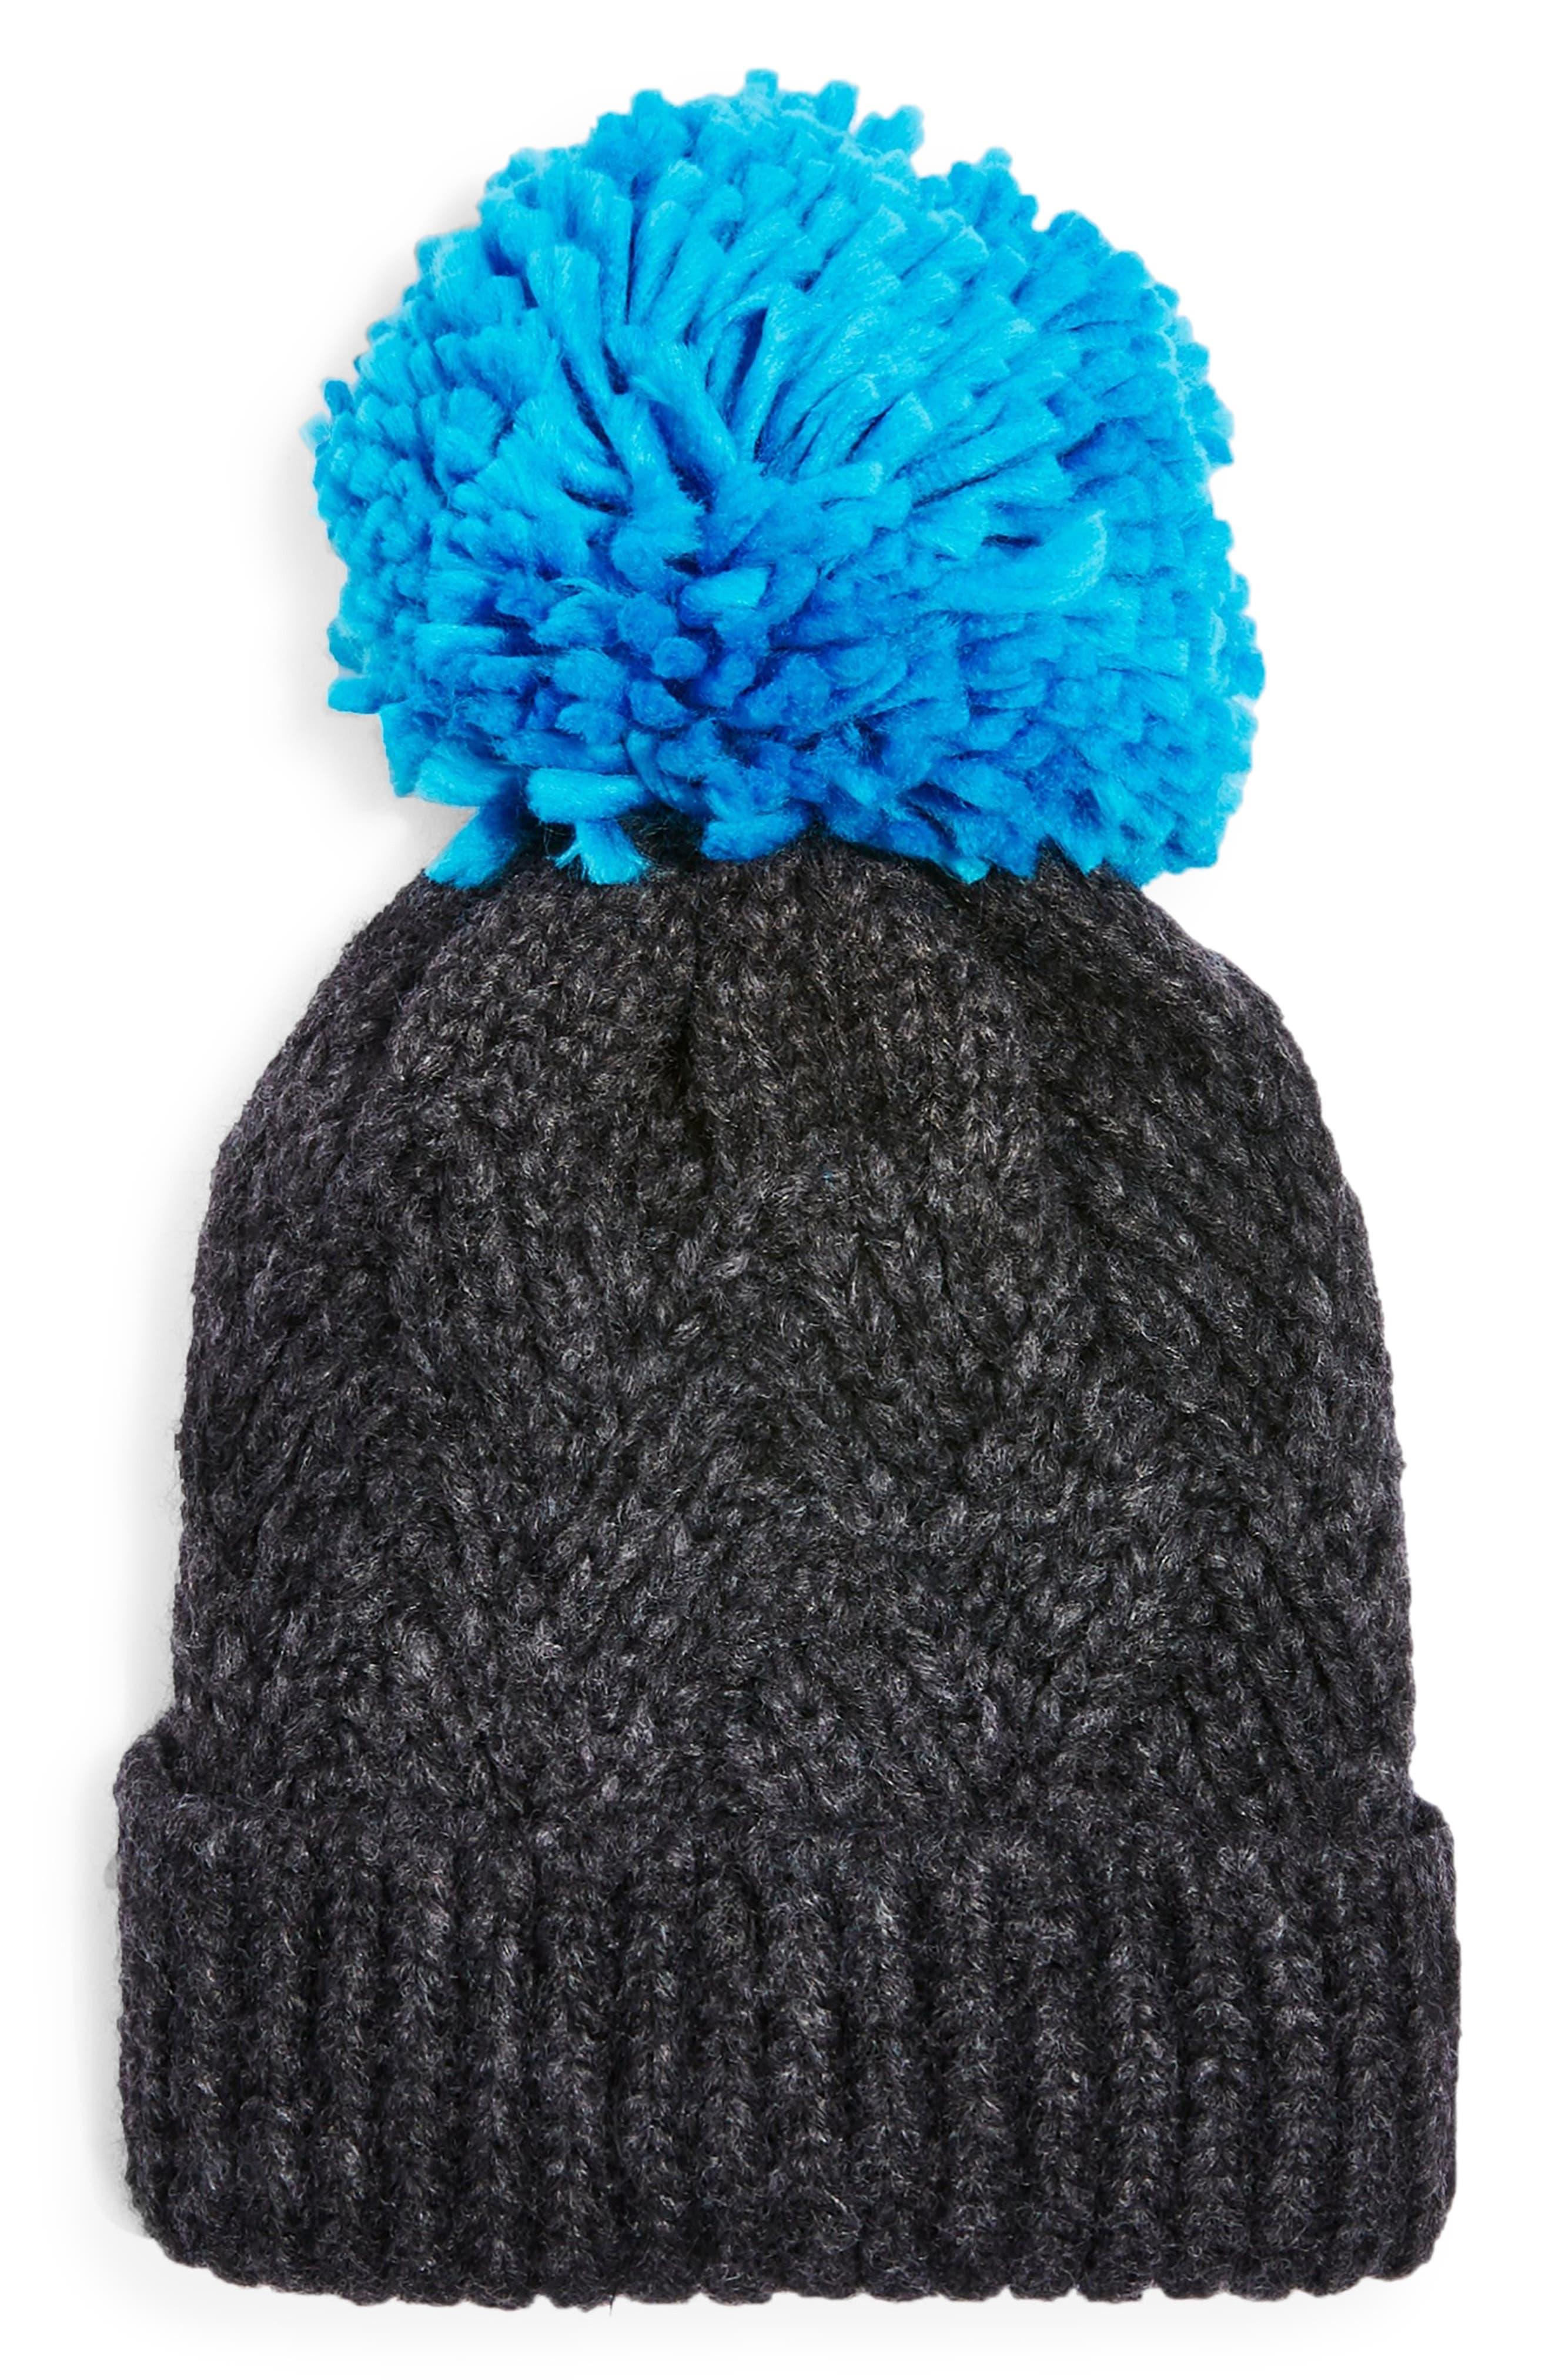 Topshop Chevron Knit Beanie Hat - Grey